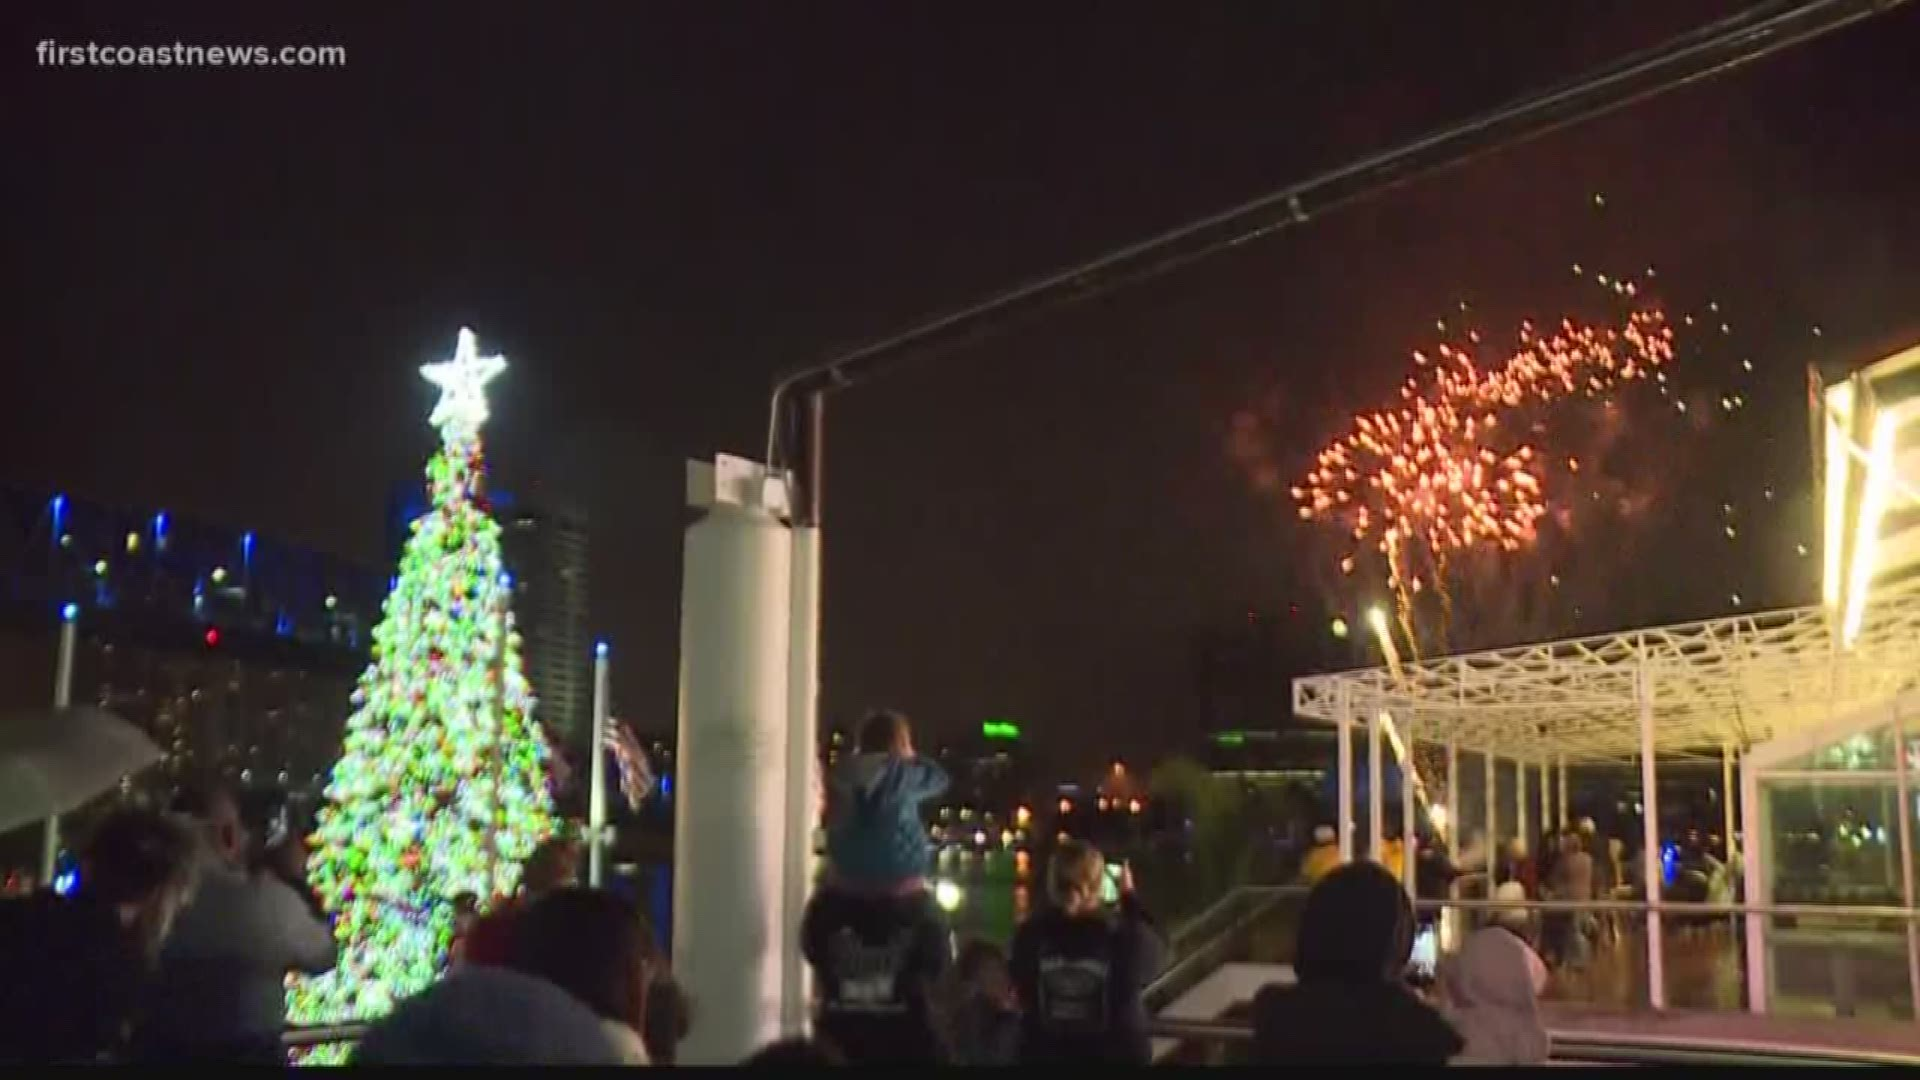 jacksonville christmas tree lighting happens at hemming park as landing waits to be demolished